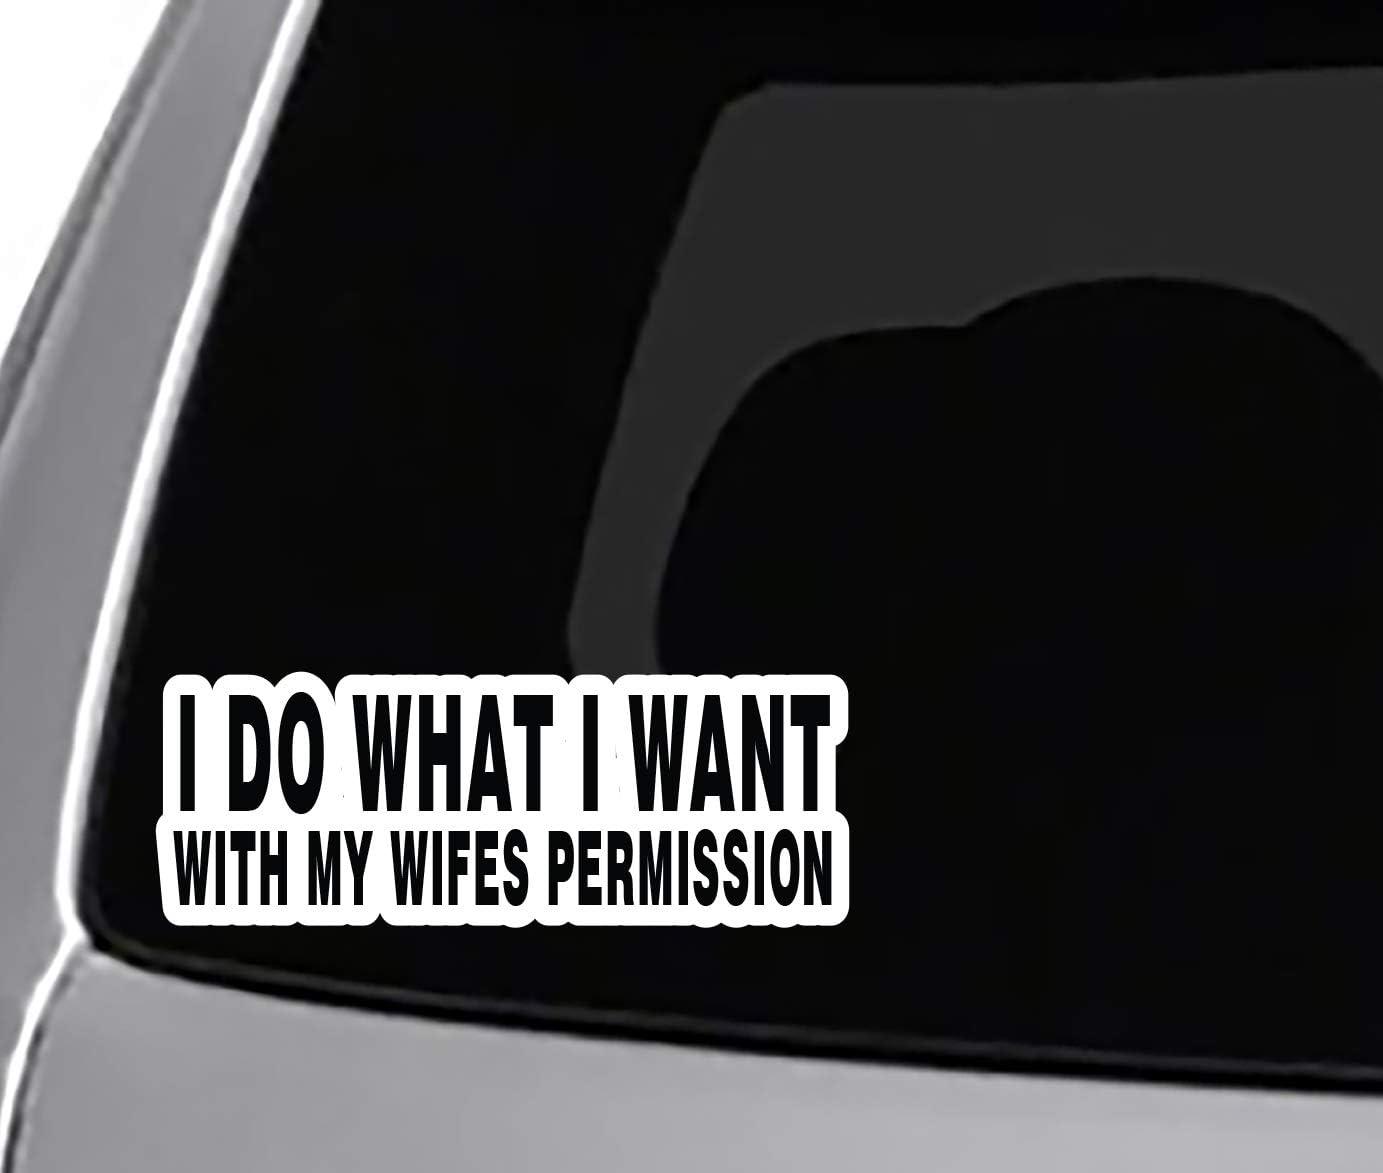 Rogue River Tactical I Love My Wife Sticker Husband Heart Oval 5x3 Car Truck Window Decal Bumper Sticker